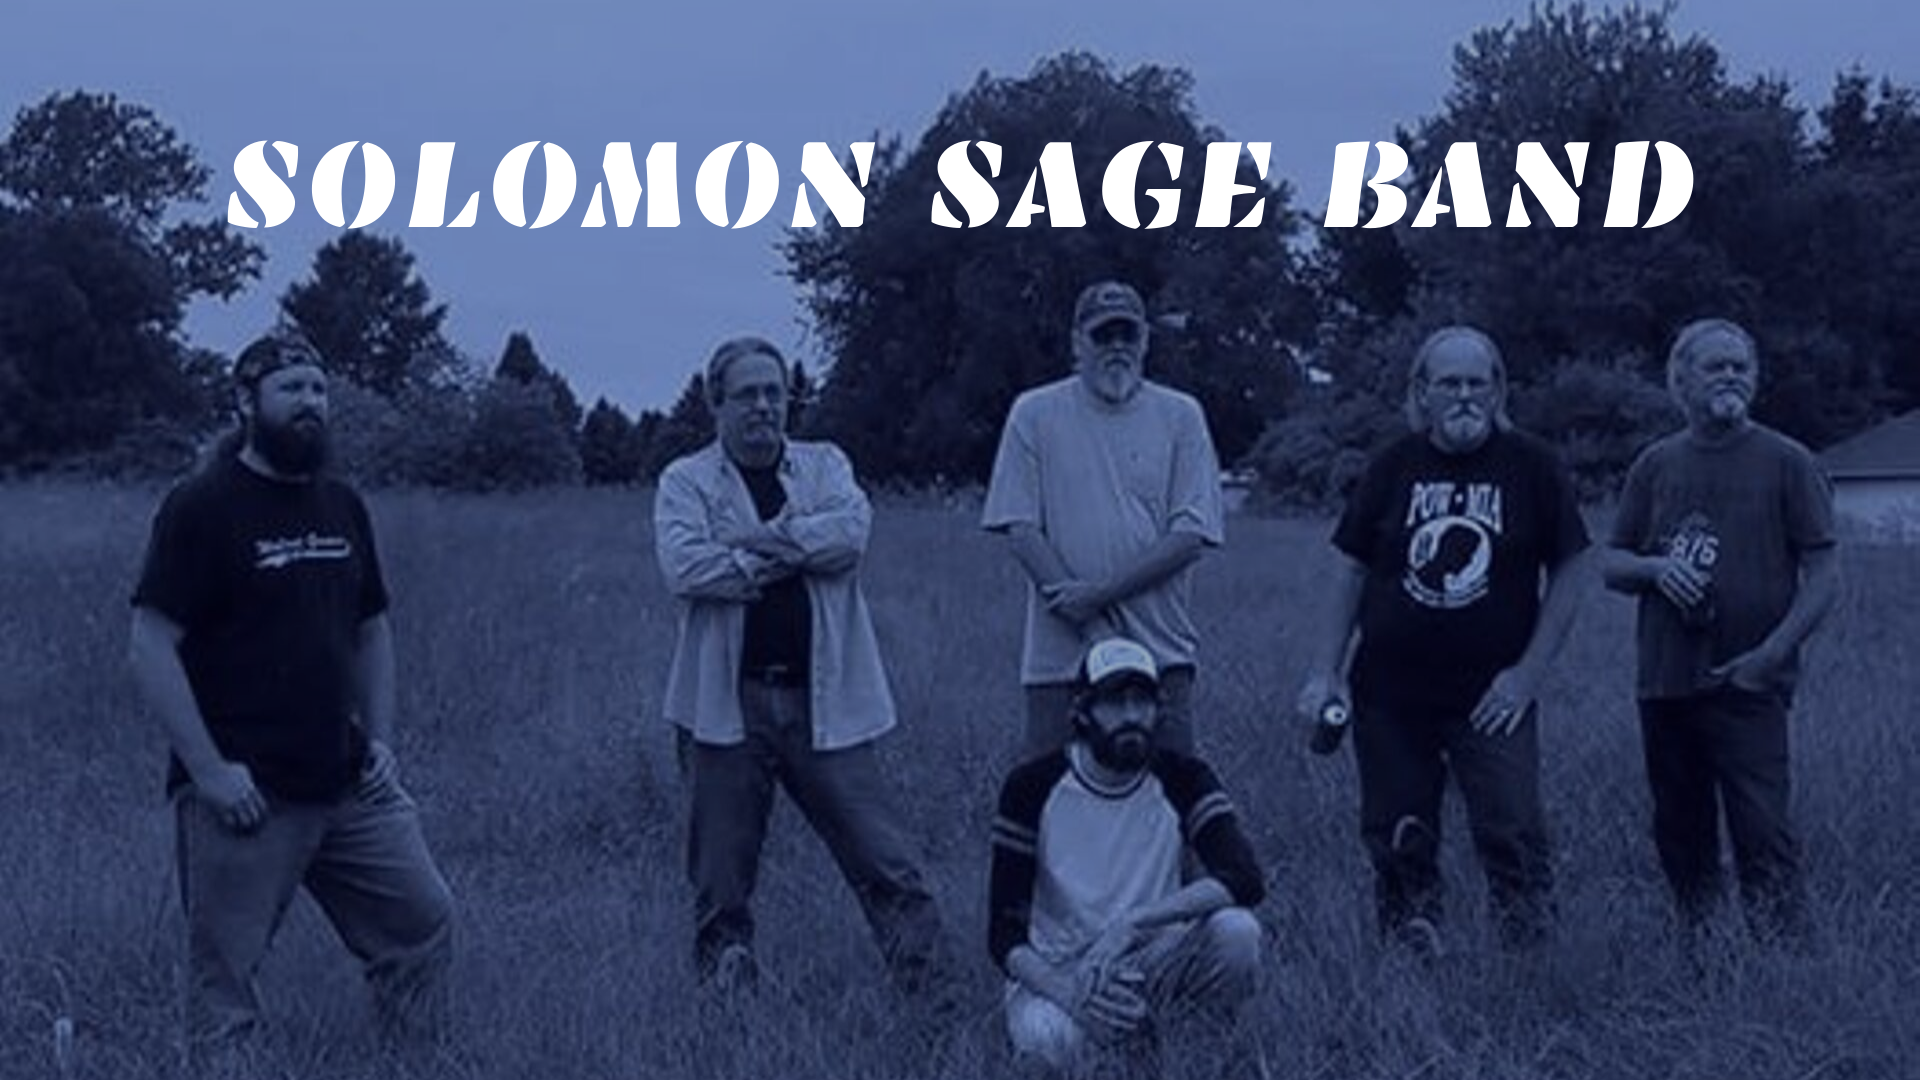 SOLOMON SAGE BAND.png